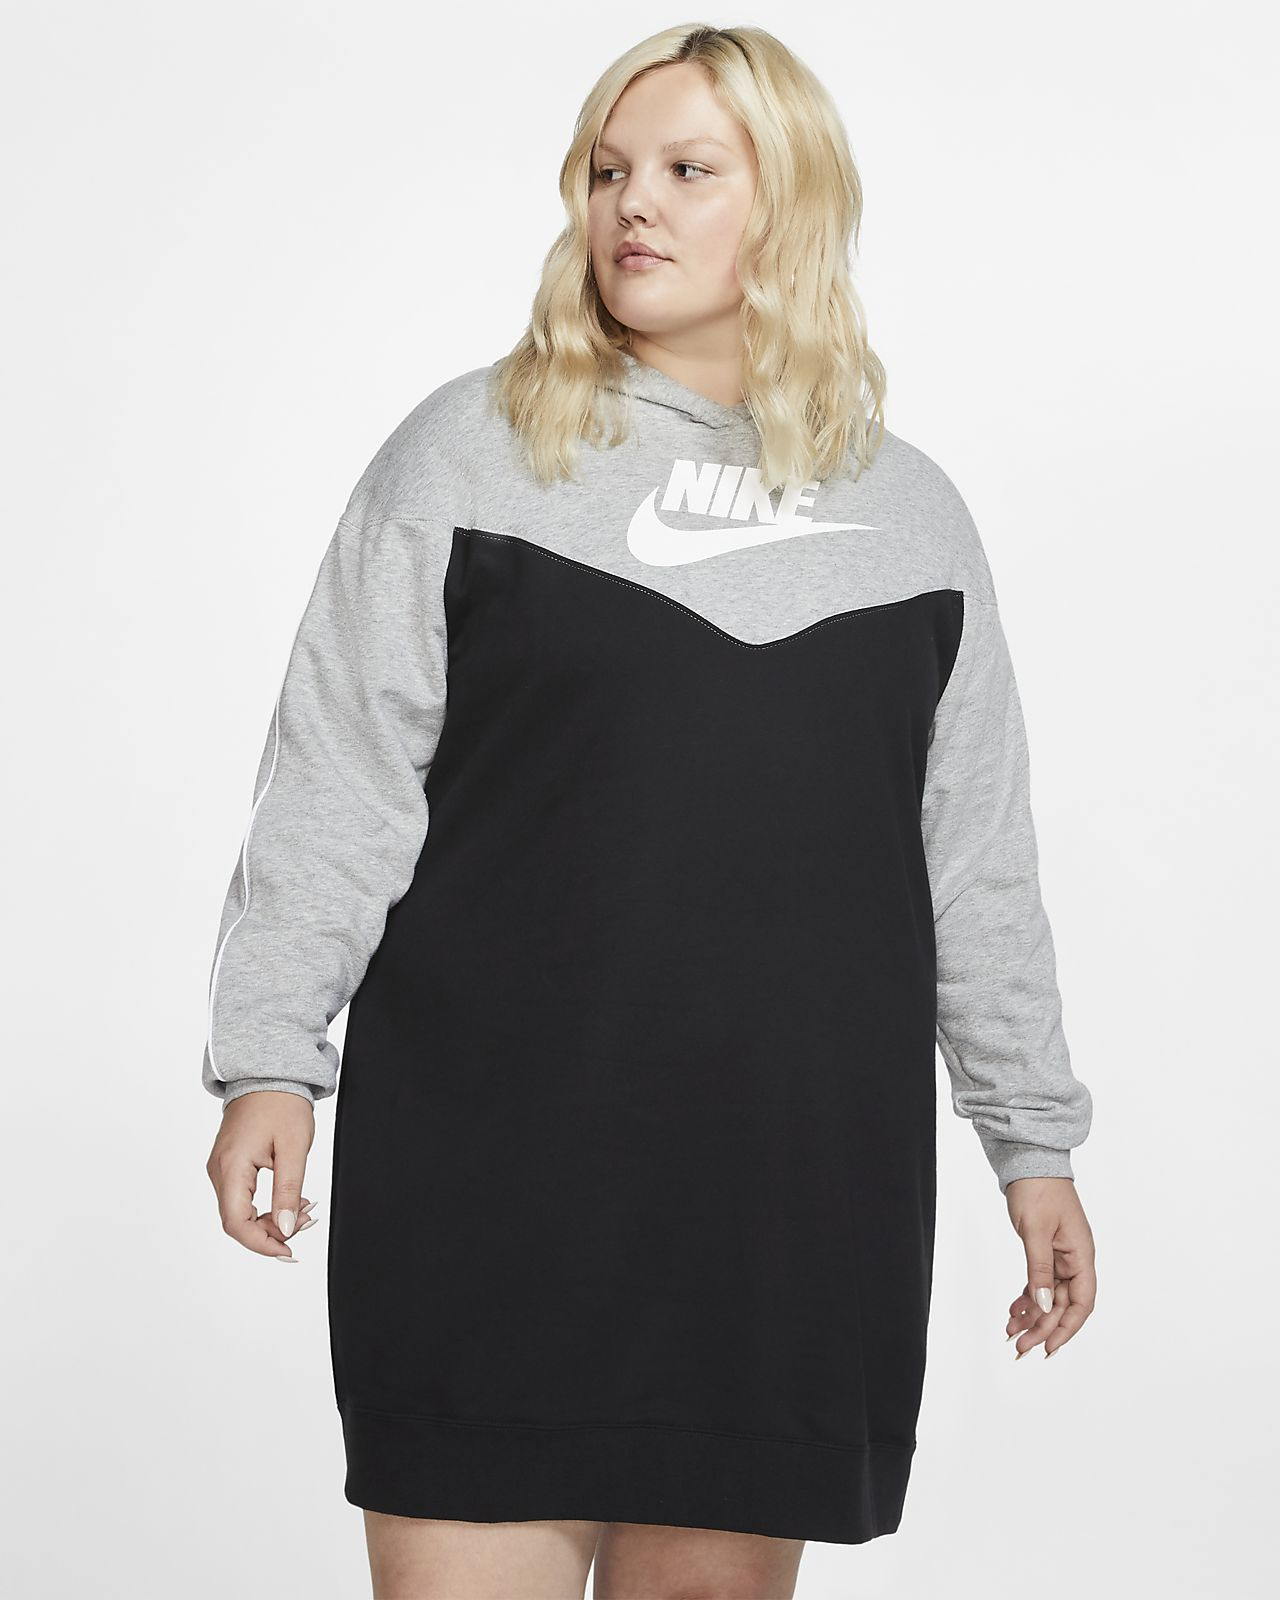 Planificado Reportero arbusto  Nike Sportswear Heritage Women's Hooded Dress (Plus Size). Nike.com    Hoodie dress, Plus size hoodies, Hooded dress